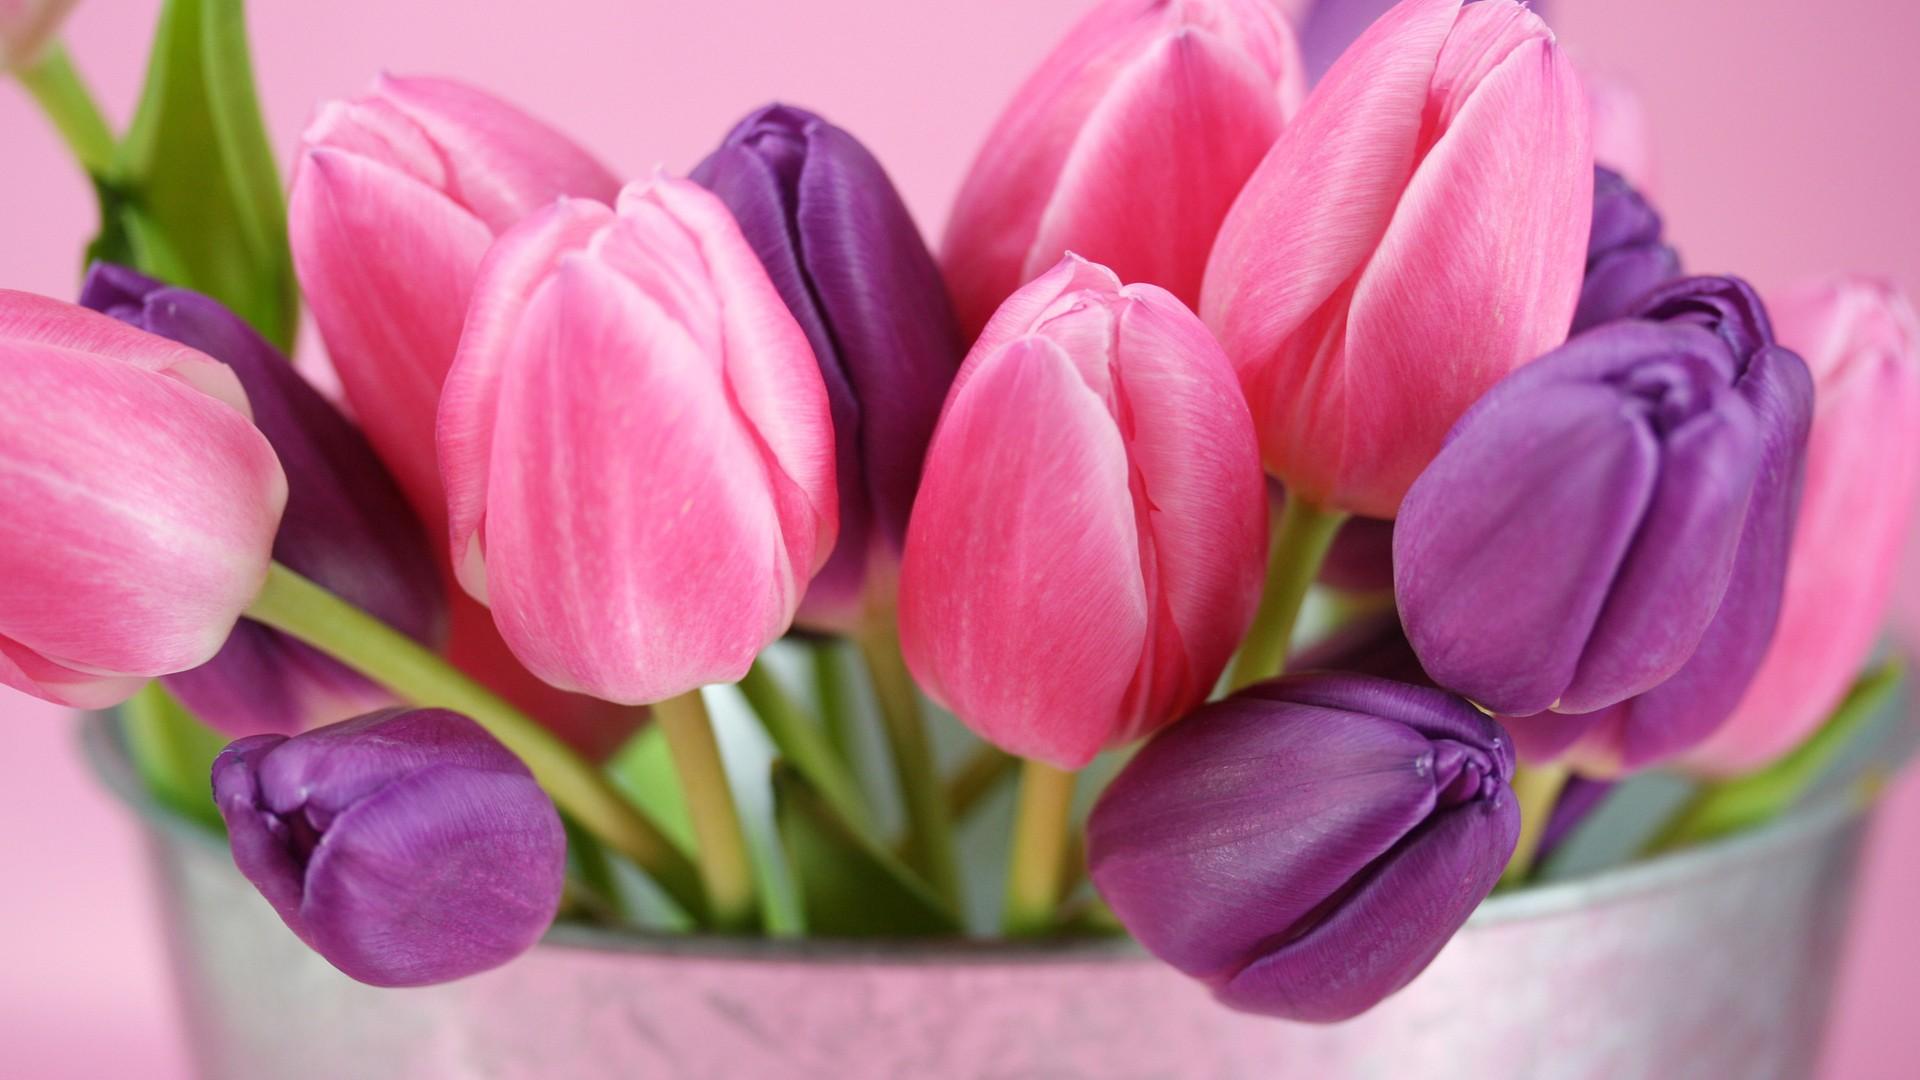 Women's Day Flower wallpaper download